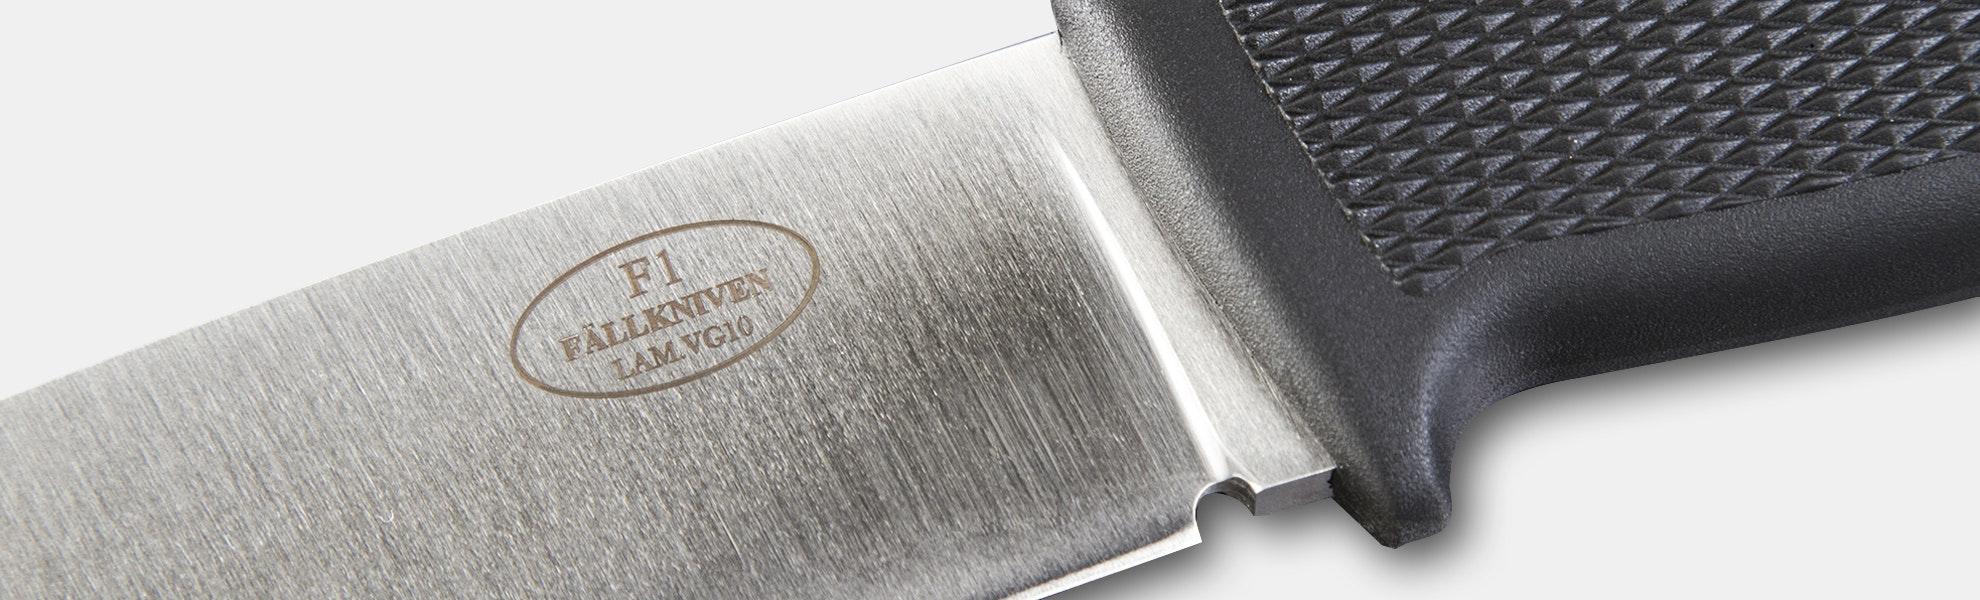 Fallkniven F1Z Survival Knife VG-10 w/ Zytel Sheath